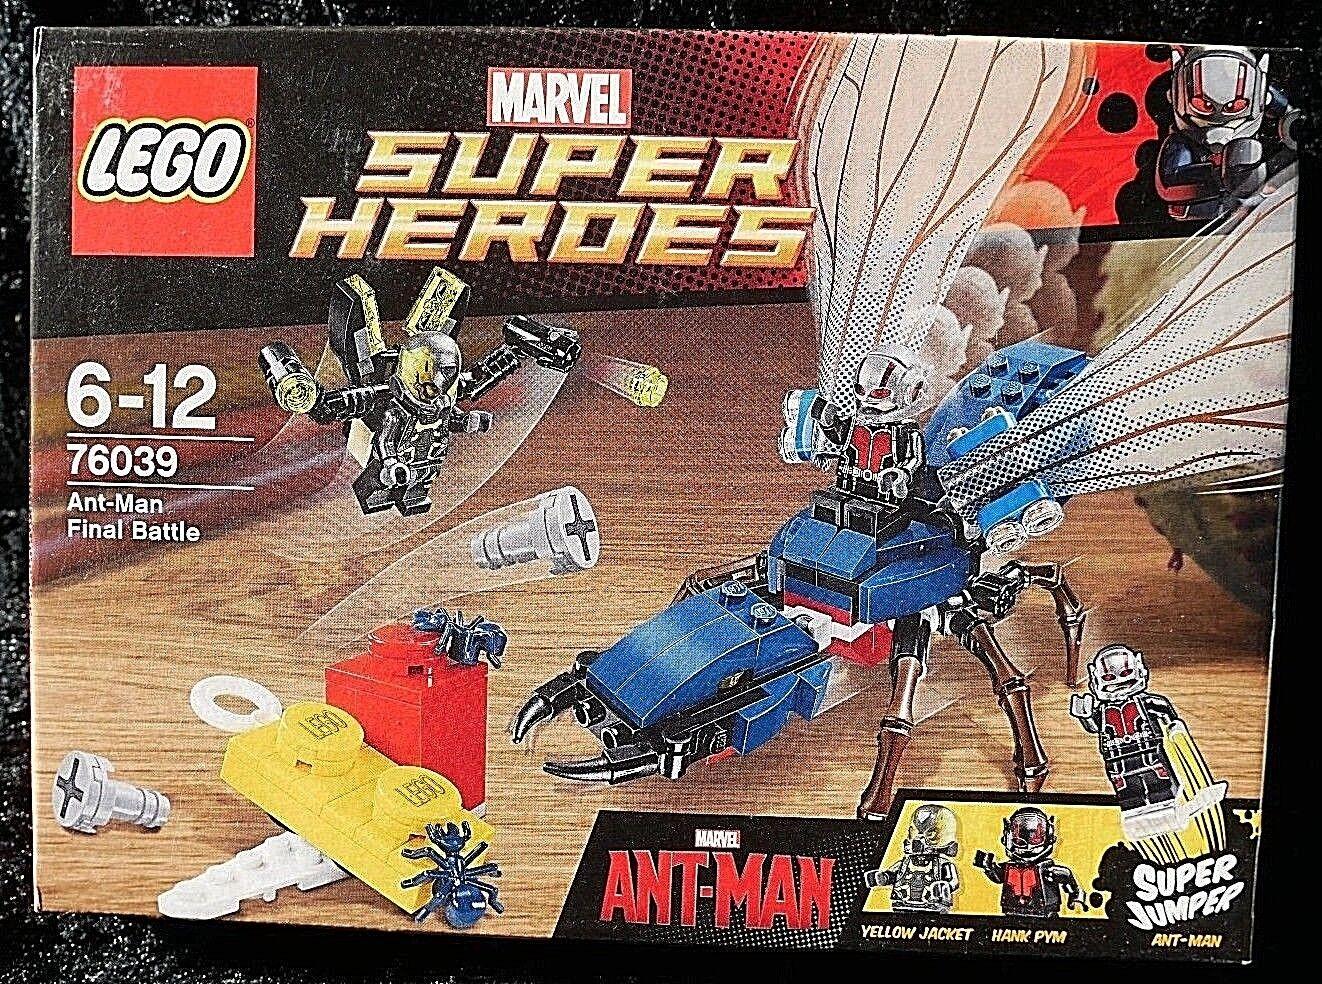 76039 LEGO MARVEL SUPERHEROES ANT-MAN FINAL BATTLE - RETIROT SET NEW SEALED A1